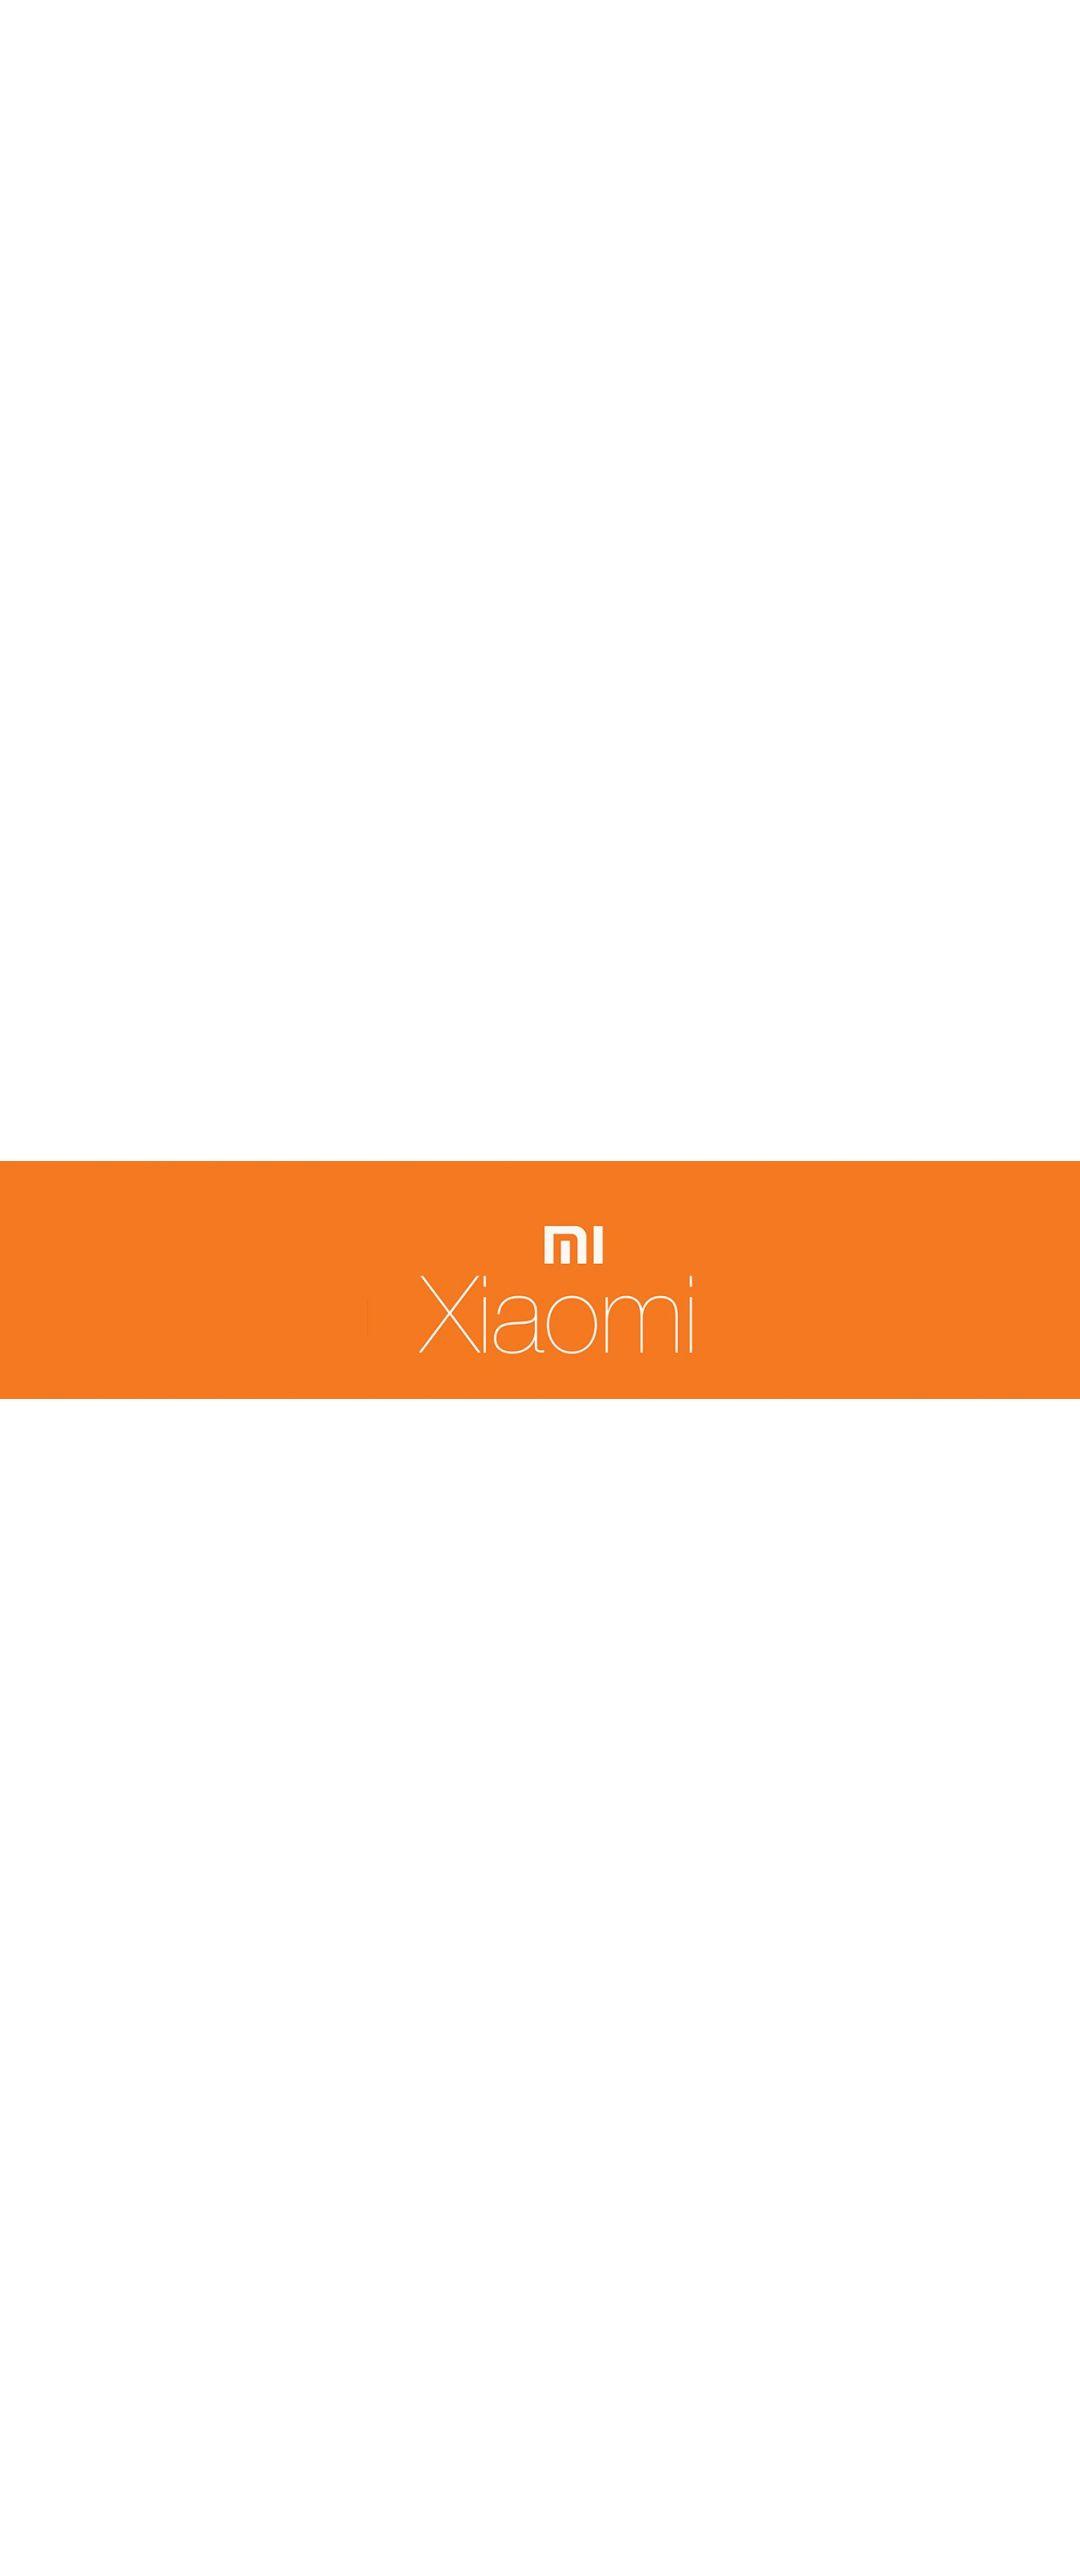 Xiaomi libera MIUI 8 basada en Android Nougat